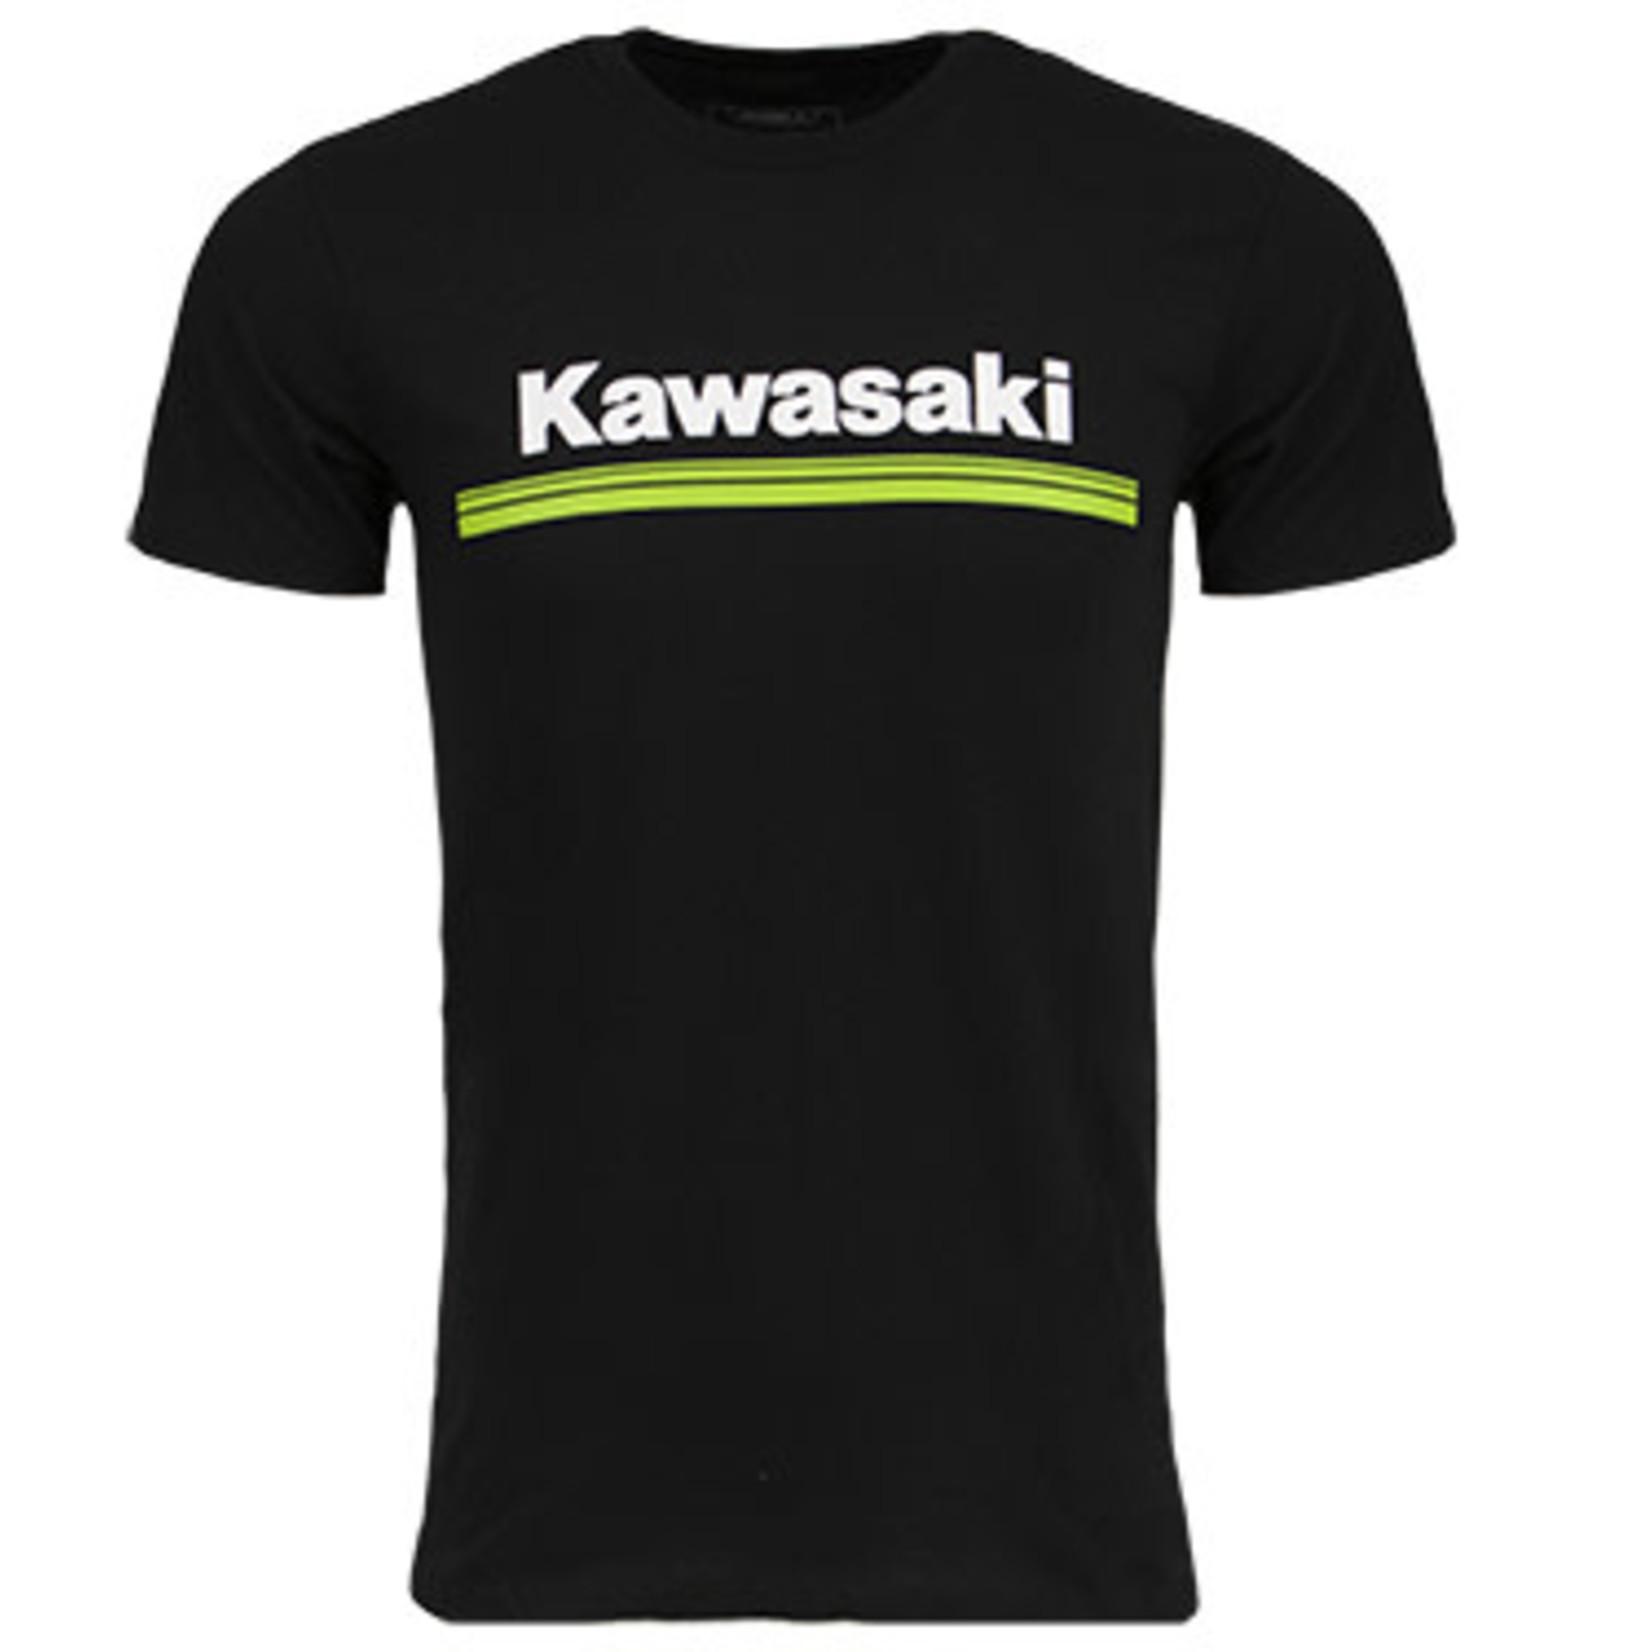 Kawasaki Kawasaki 3 Lines Tee